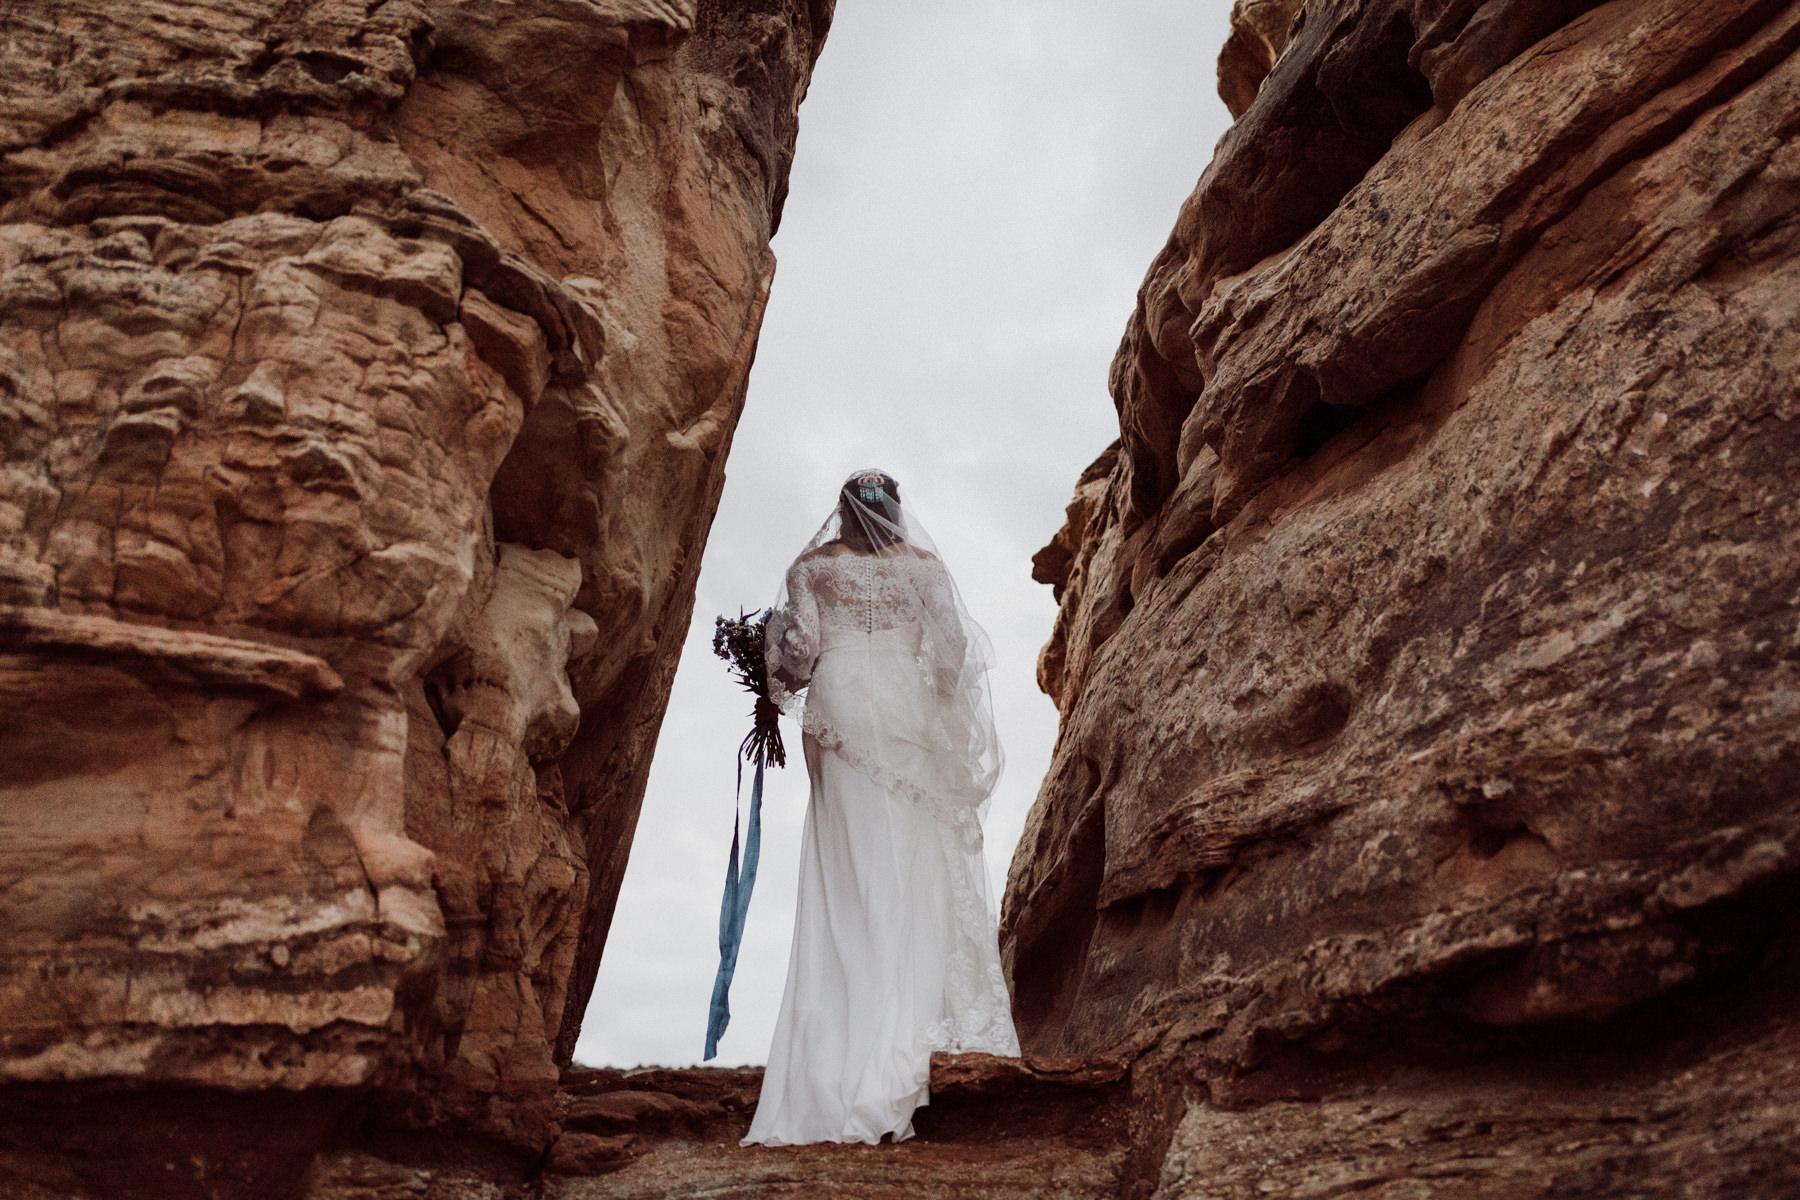 moab-adventure-elopement-3.jpg